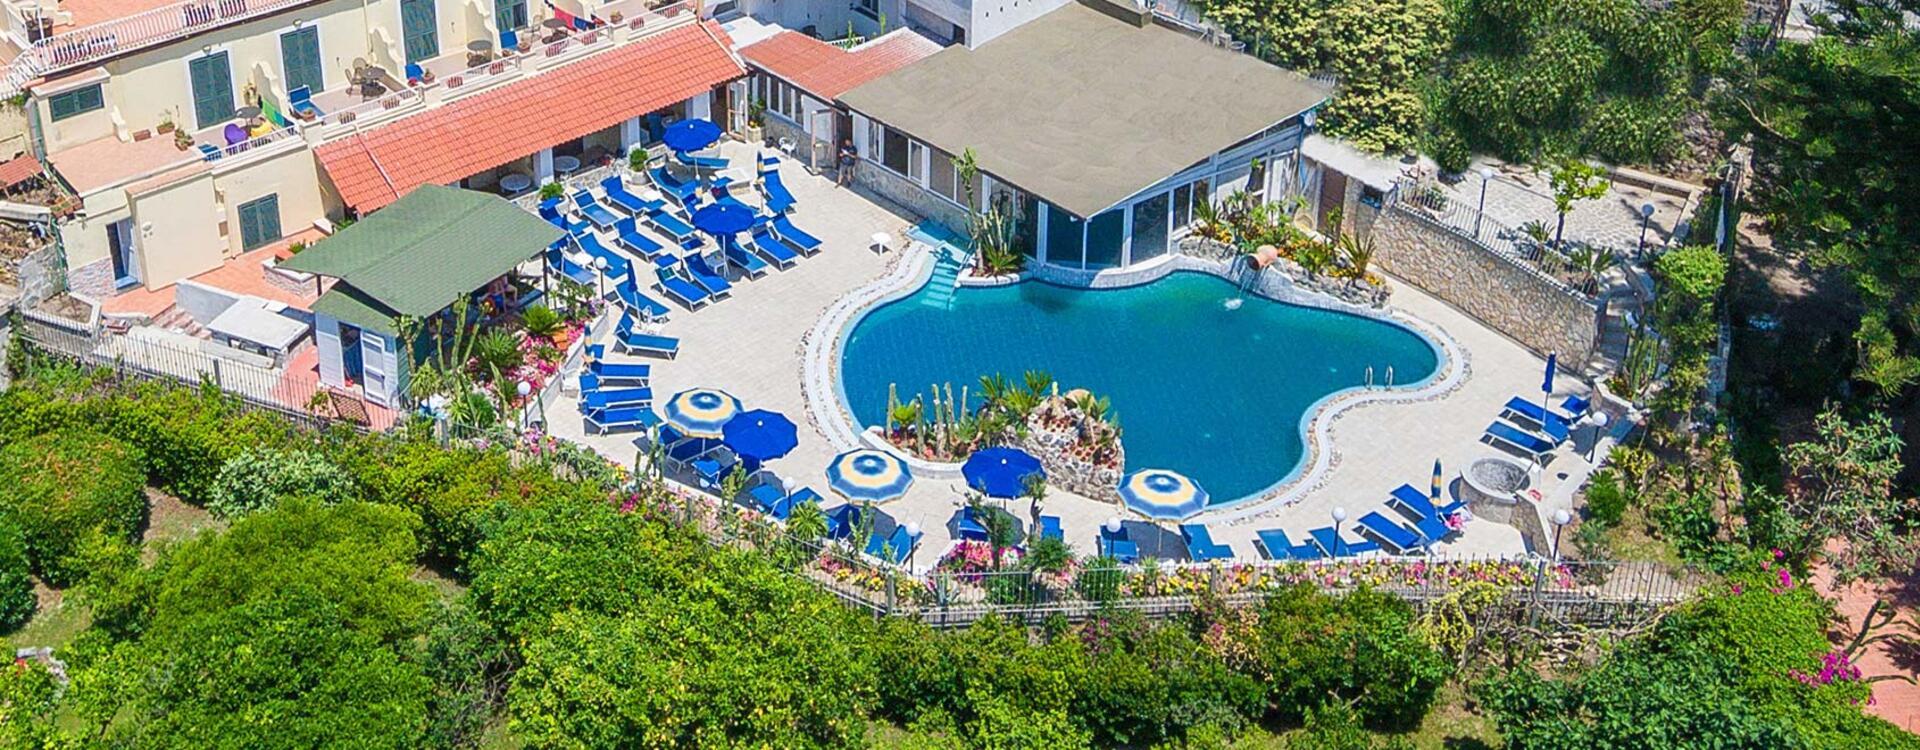 hotelsaintraphaelischia it last-minute-fine-stagione-a-ischia 010